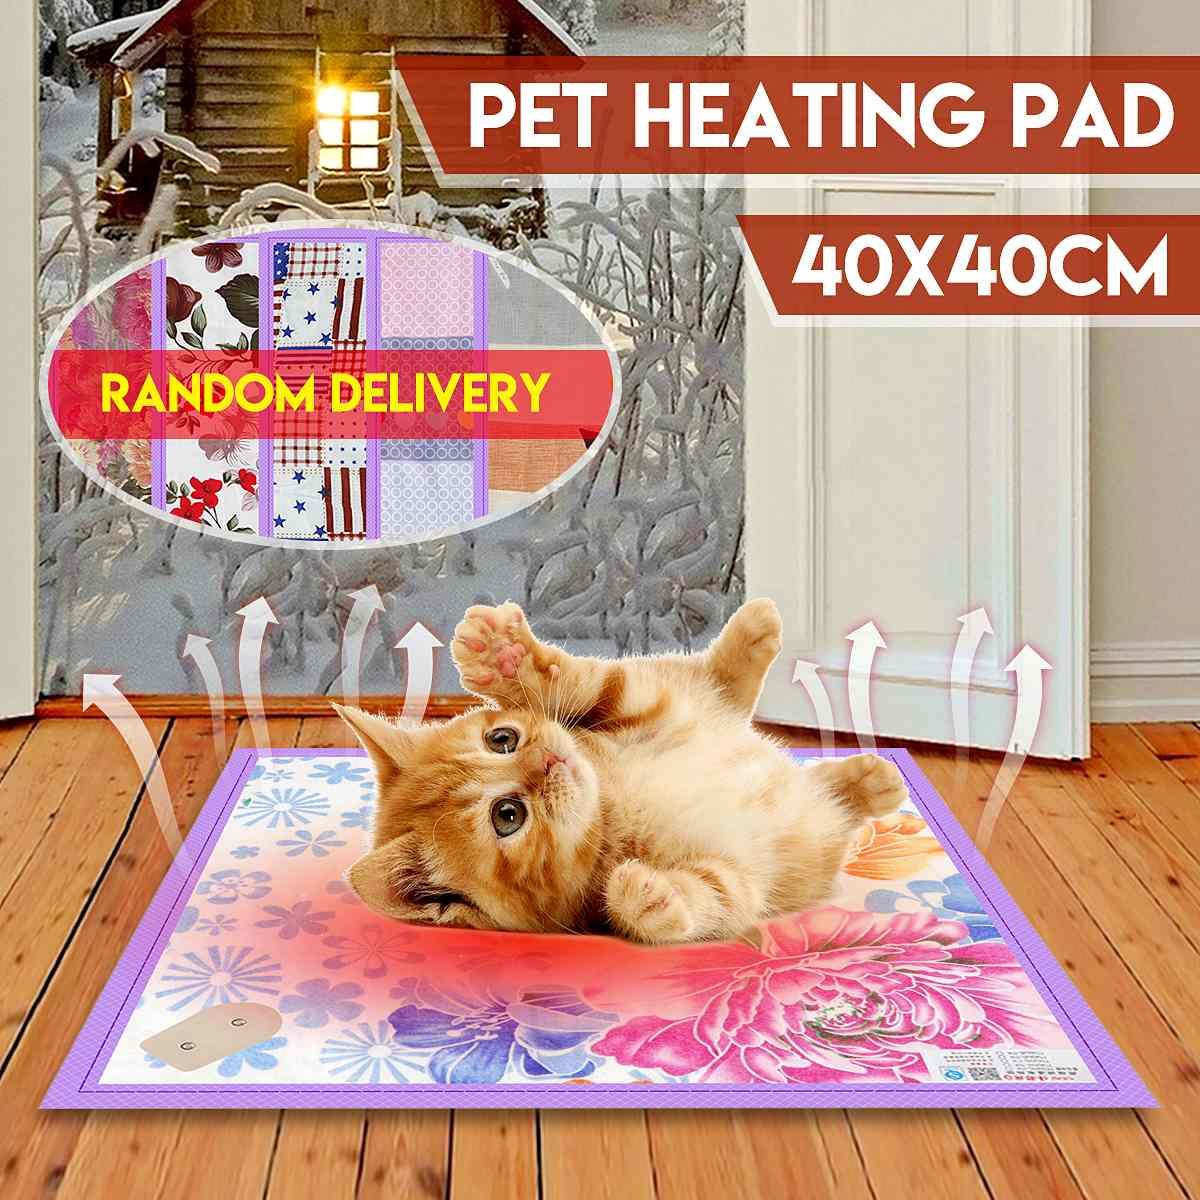 40x40cm Pet Electric Heating Pad Blanket 220V 20W Dog Cat Bunny Electric Heater Mat Blanket Bed Heated Seat Winter Body Warmer